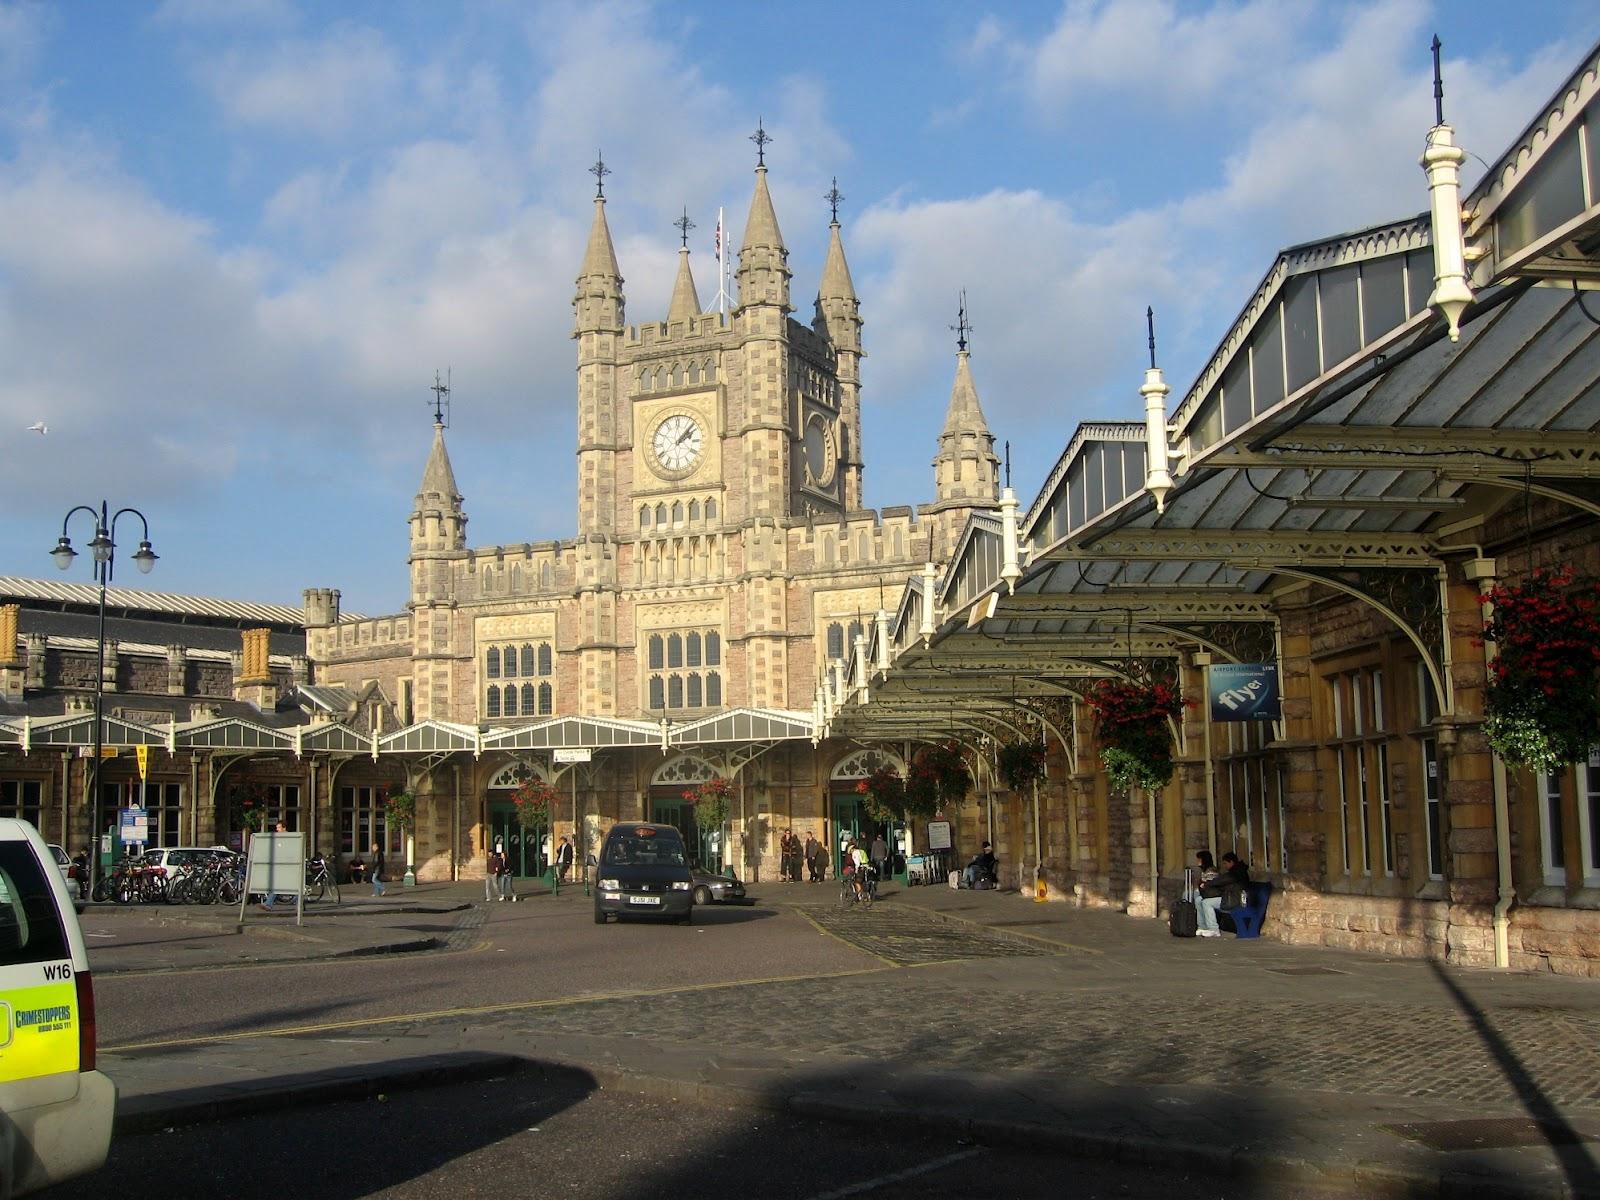 Travel & Adventures: Bristol. A voyage to Bristol, England ...